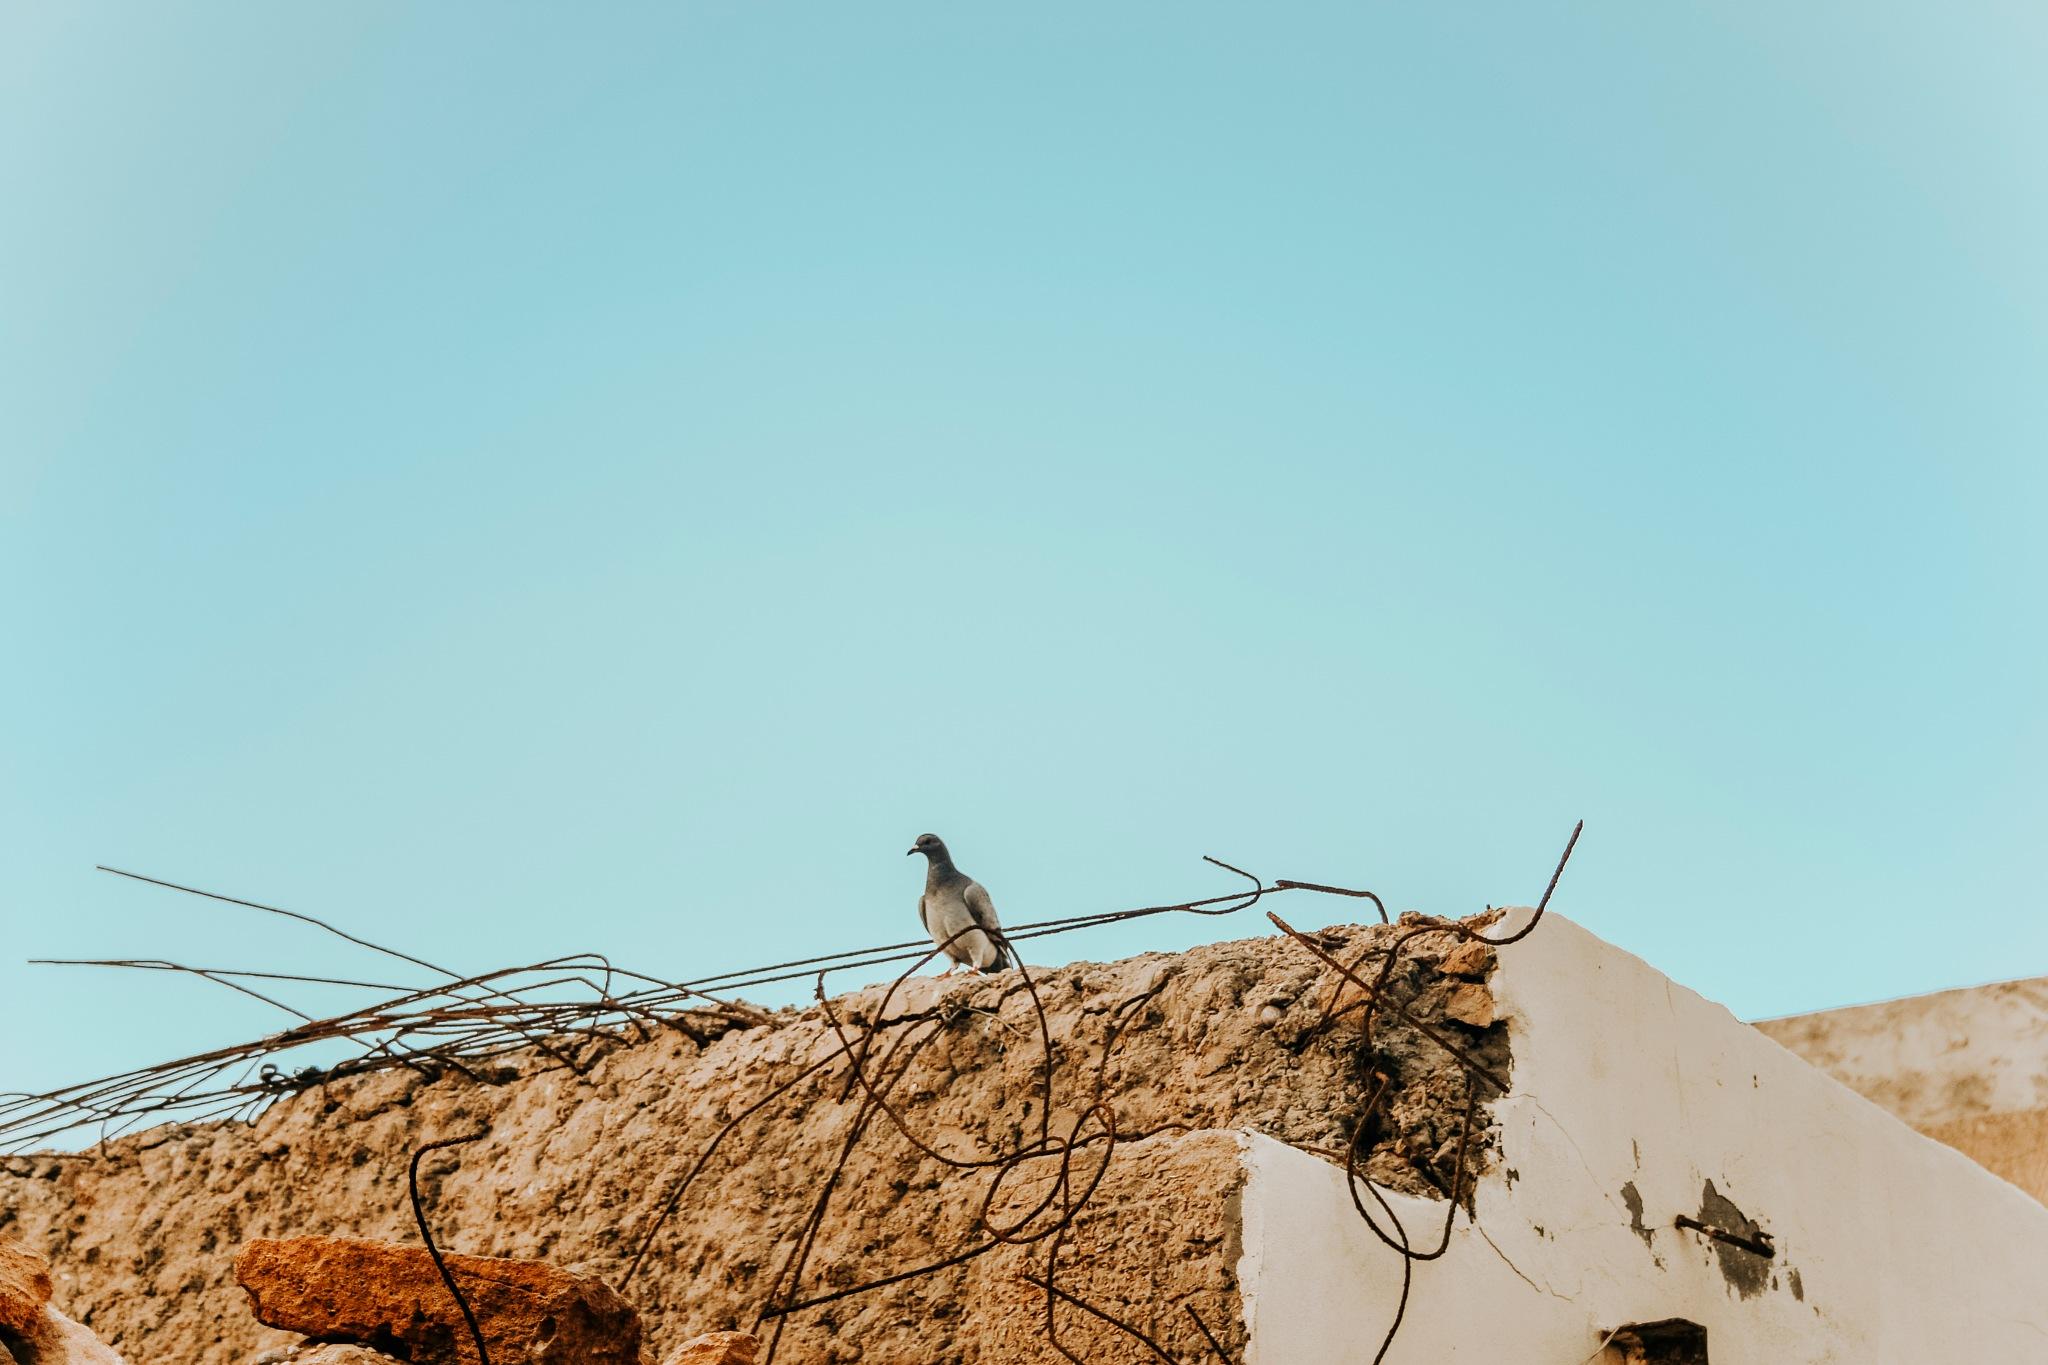 Alone by Abderrahman Ben